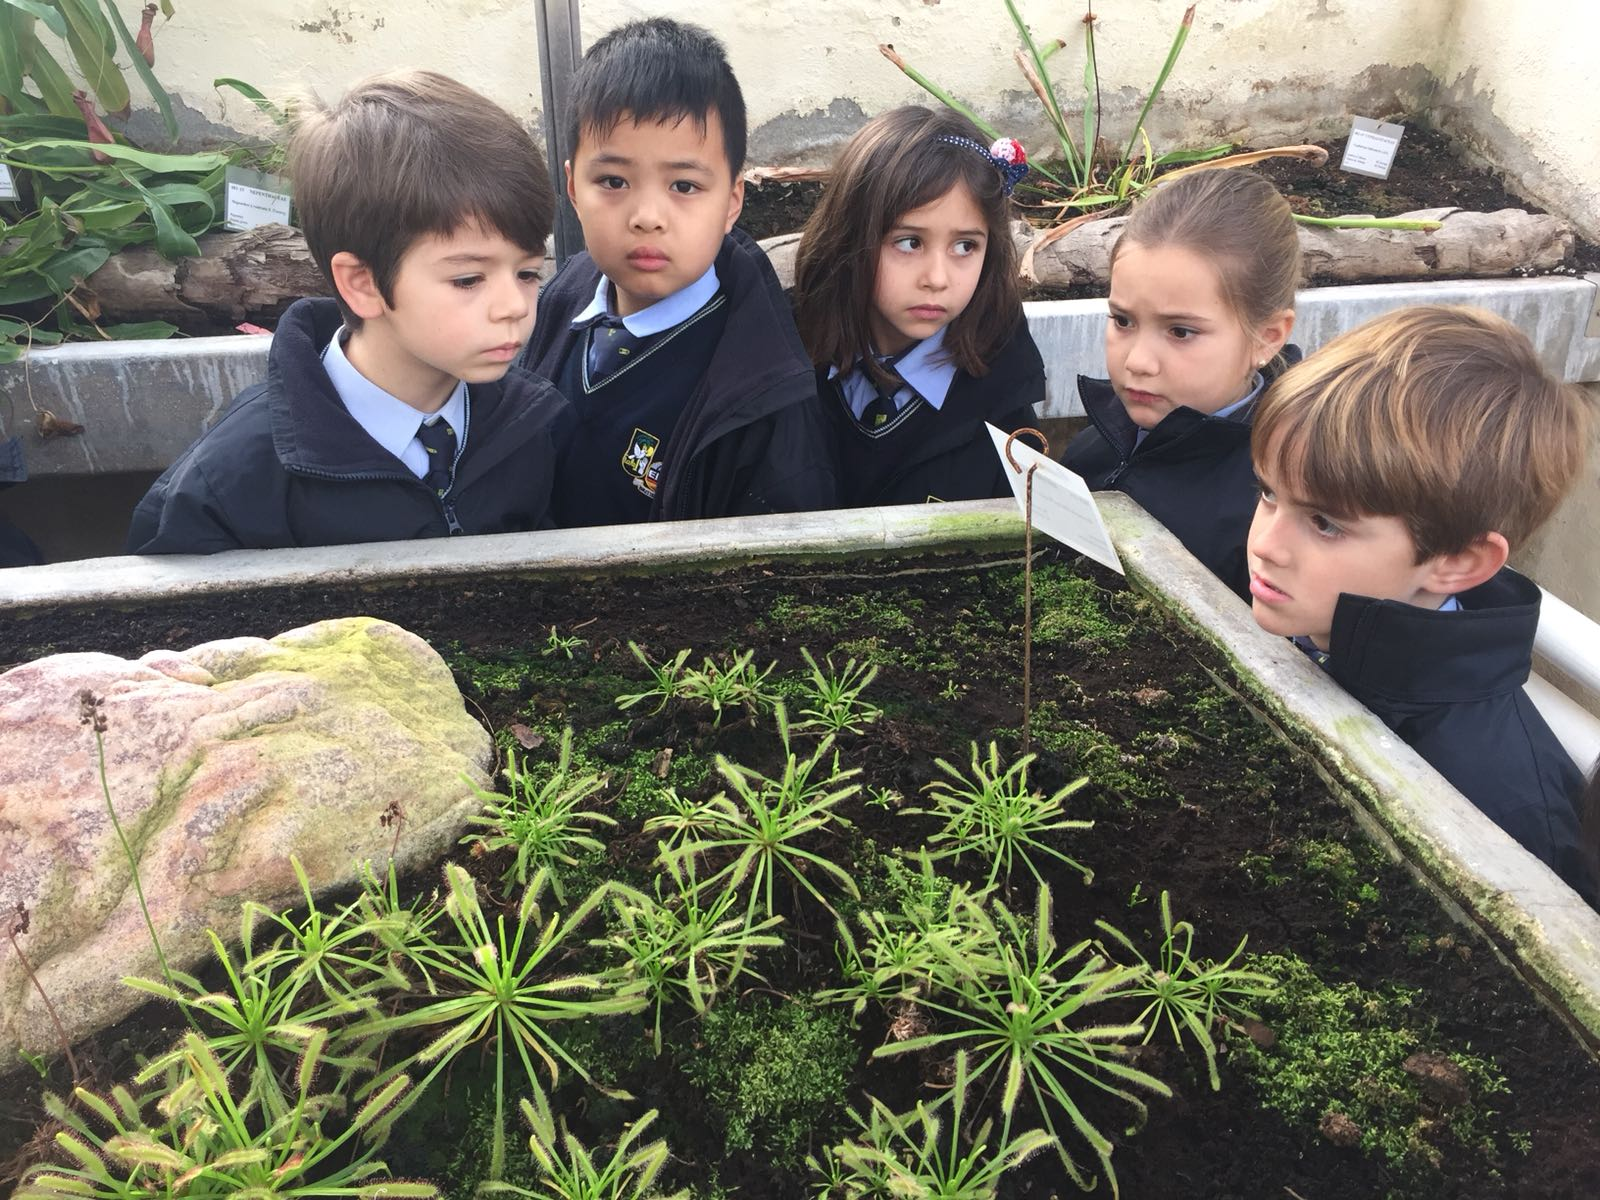 Visita al jard n bot nico for Talleres jardin botanico